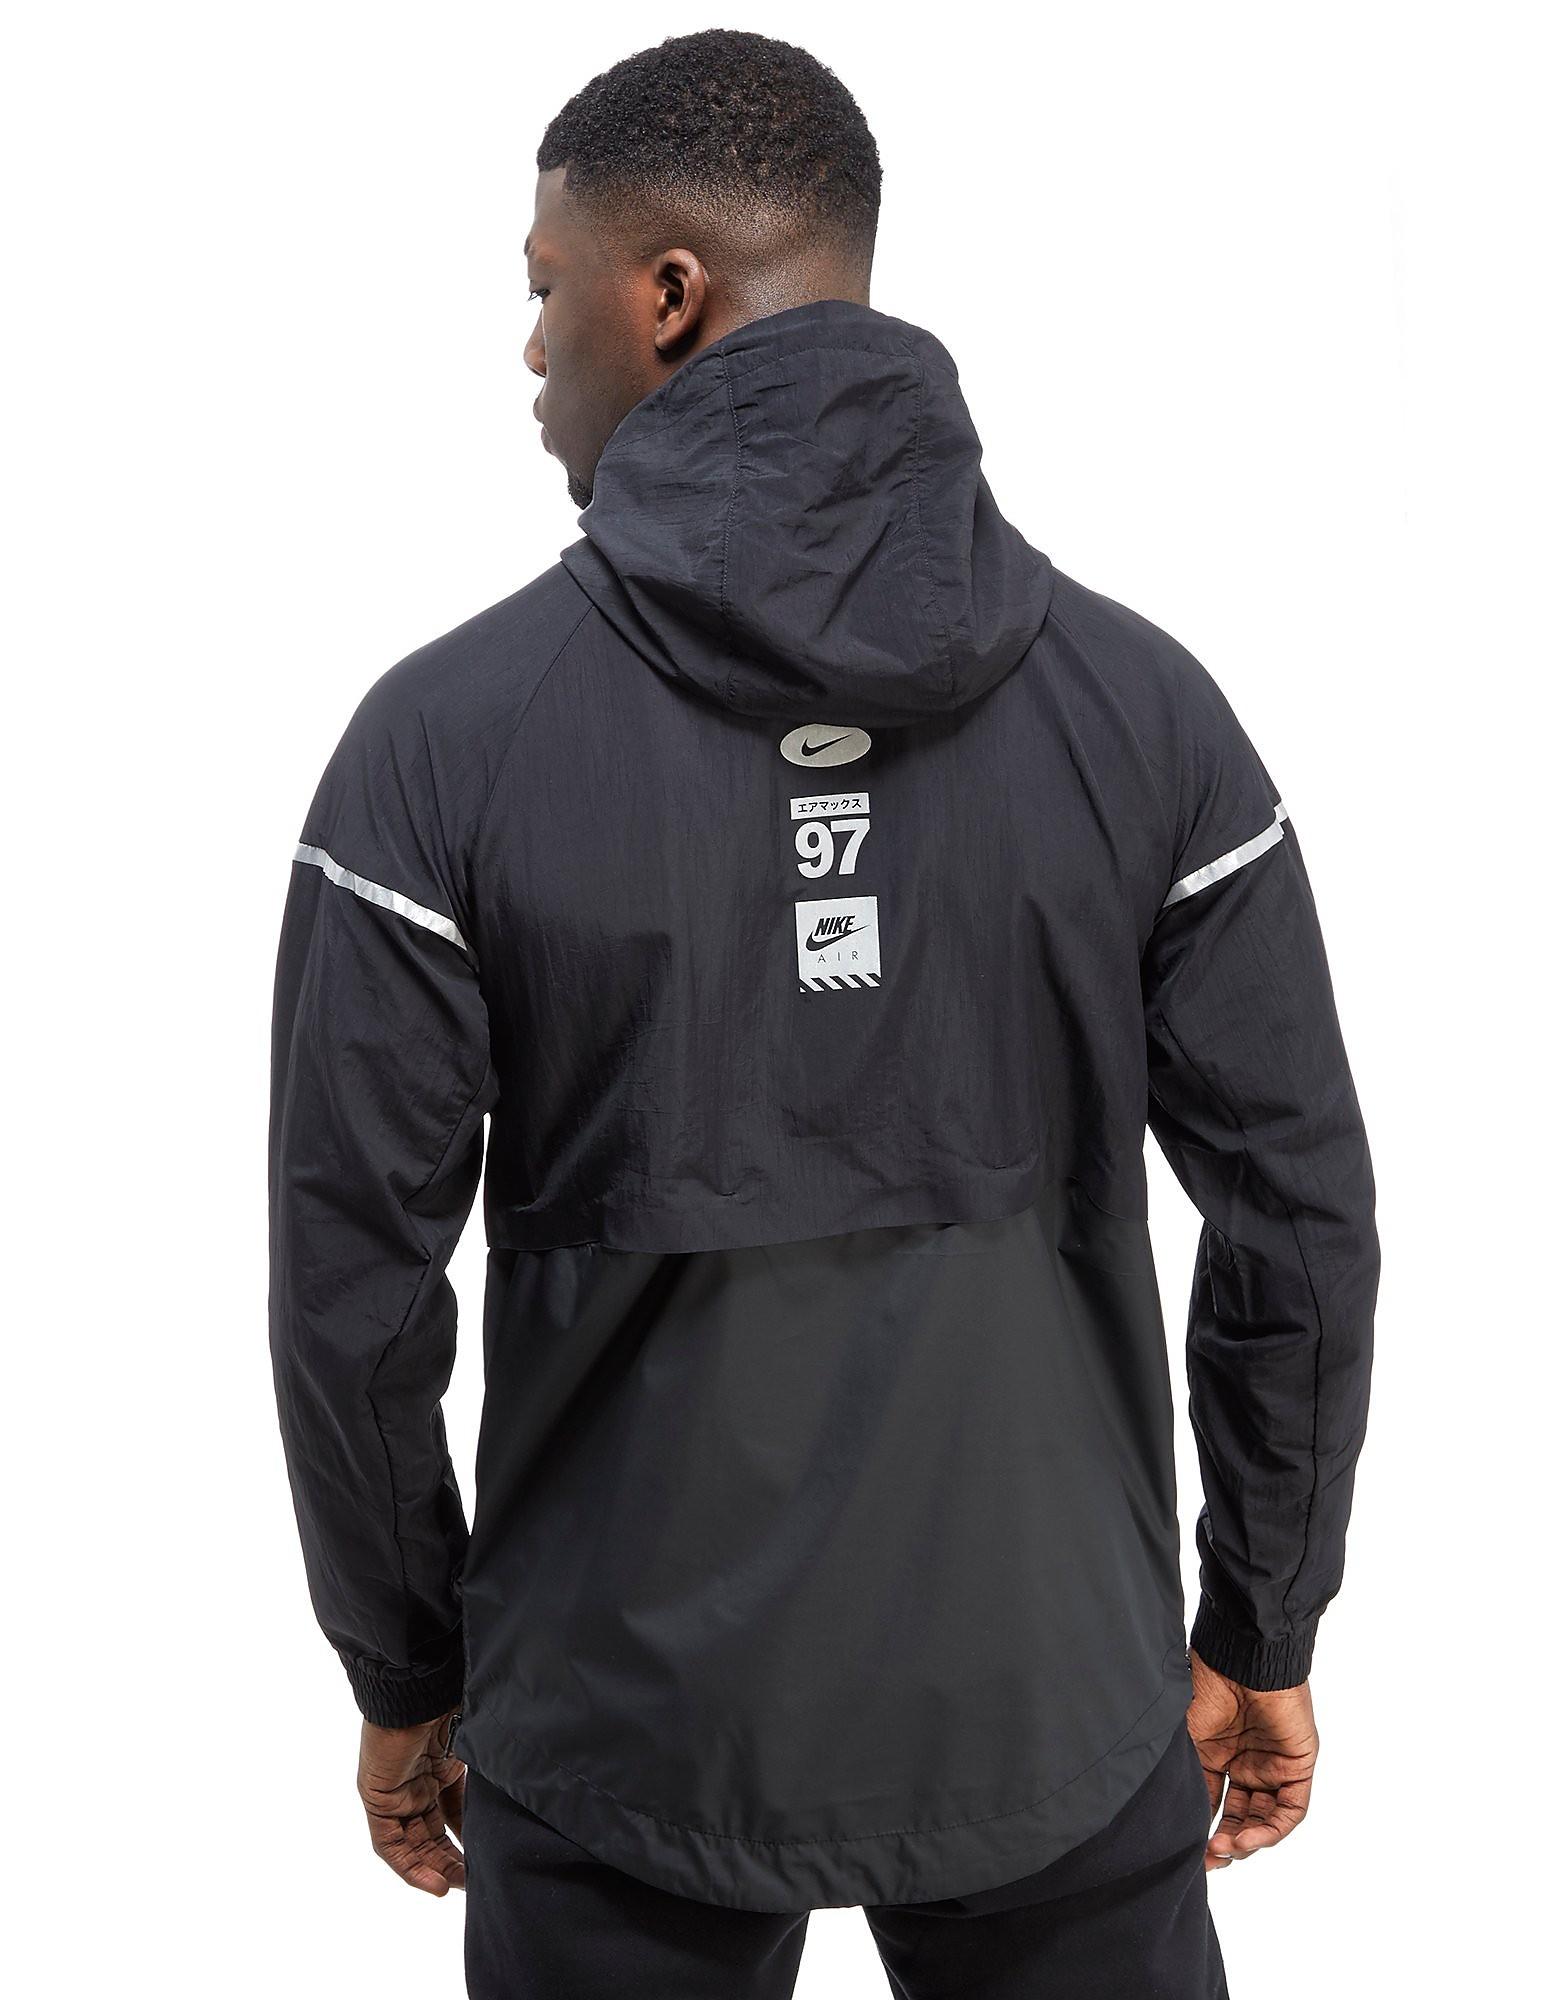 Nike Air Hybrid 1/2 Zip Woven Jacket